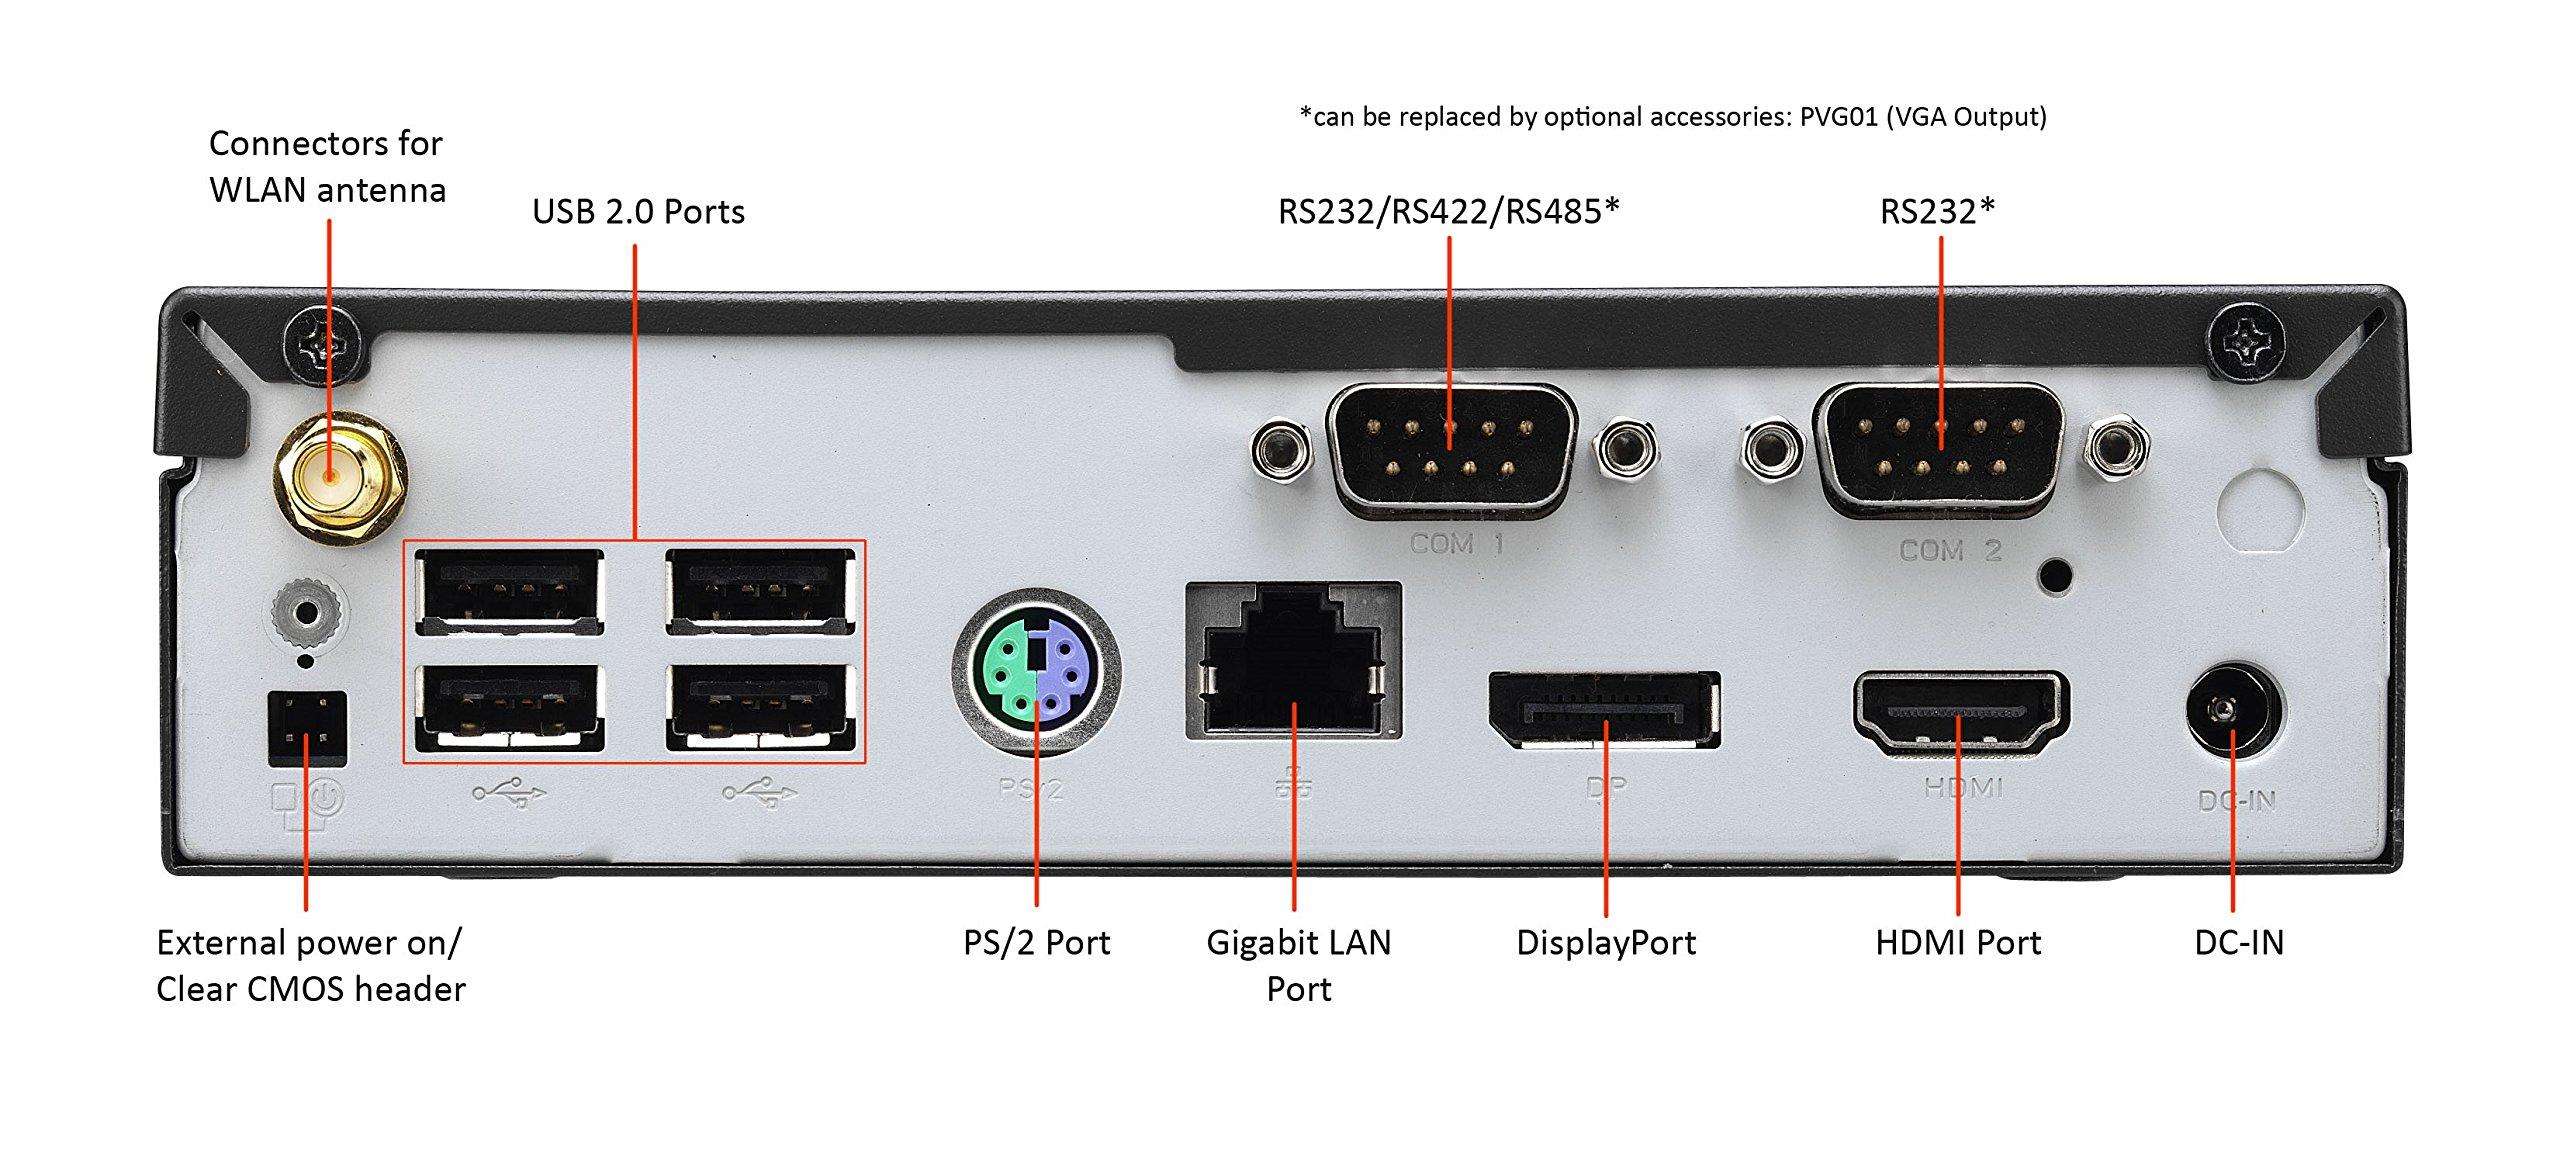 Shuttle XPC Slim DX30, Intel Apollolake Celeron J3355, Gigabit LAN, Dual COM Port, Fanless Design, DDR3L SODIMM Max 16GB by Shuttle (Image #4)